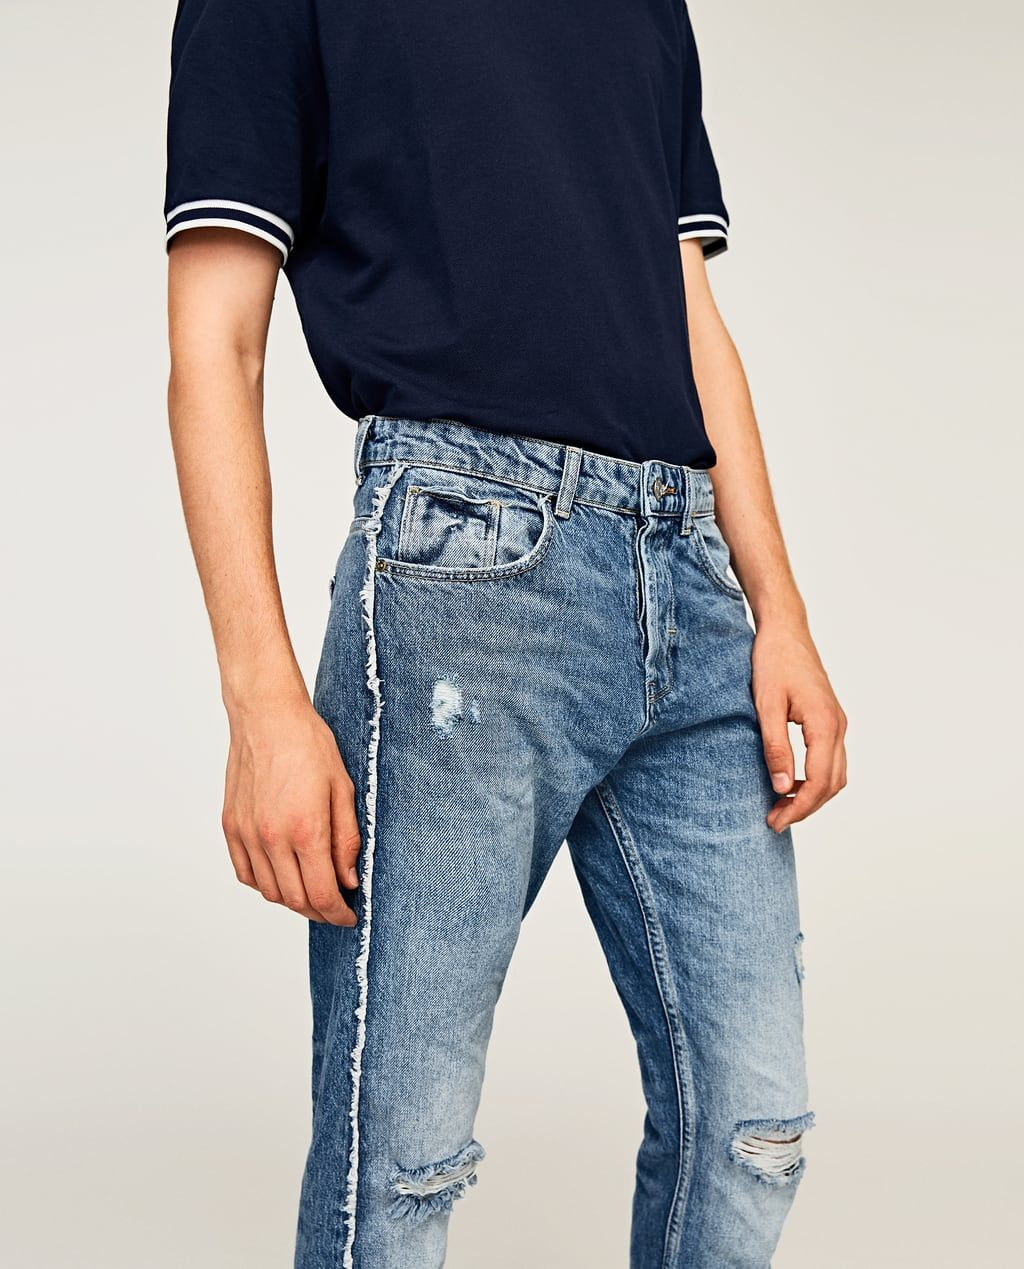 4132741a1f Soft jeans with double stripes   MENS FASHION   Jeans, Denim, Slim